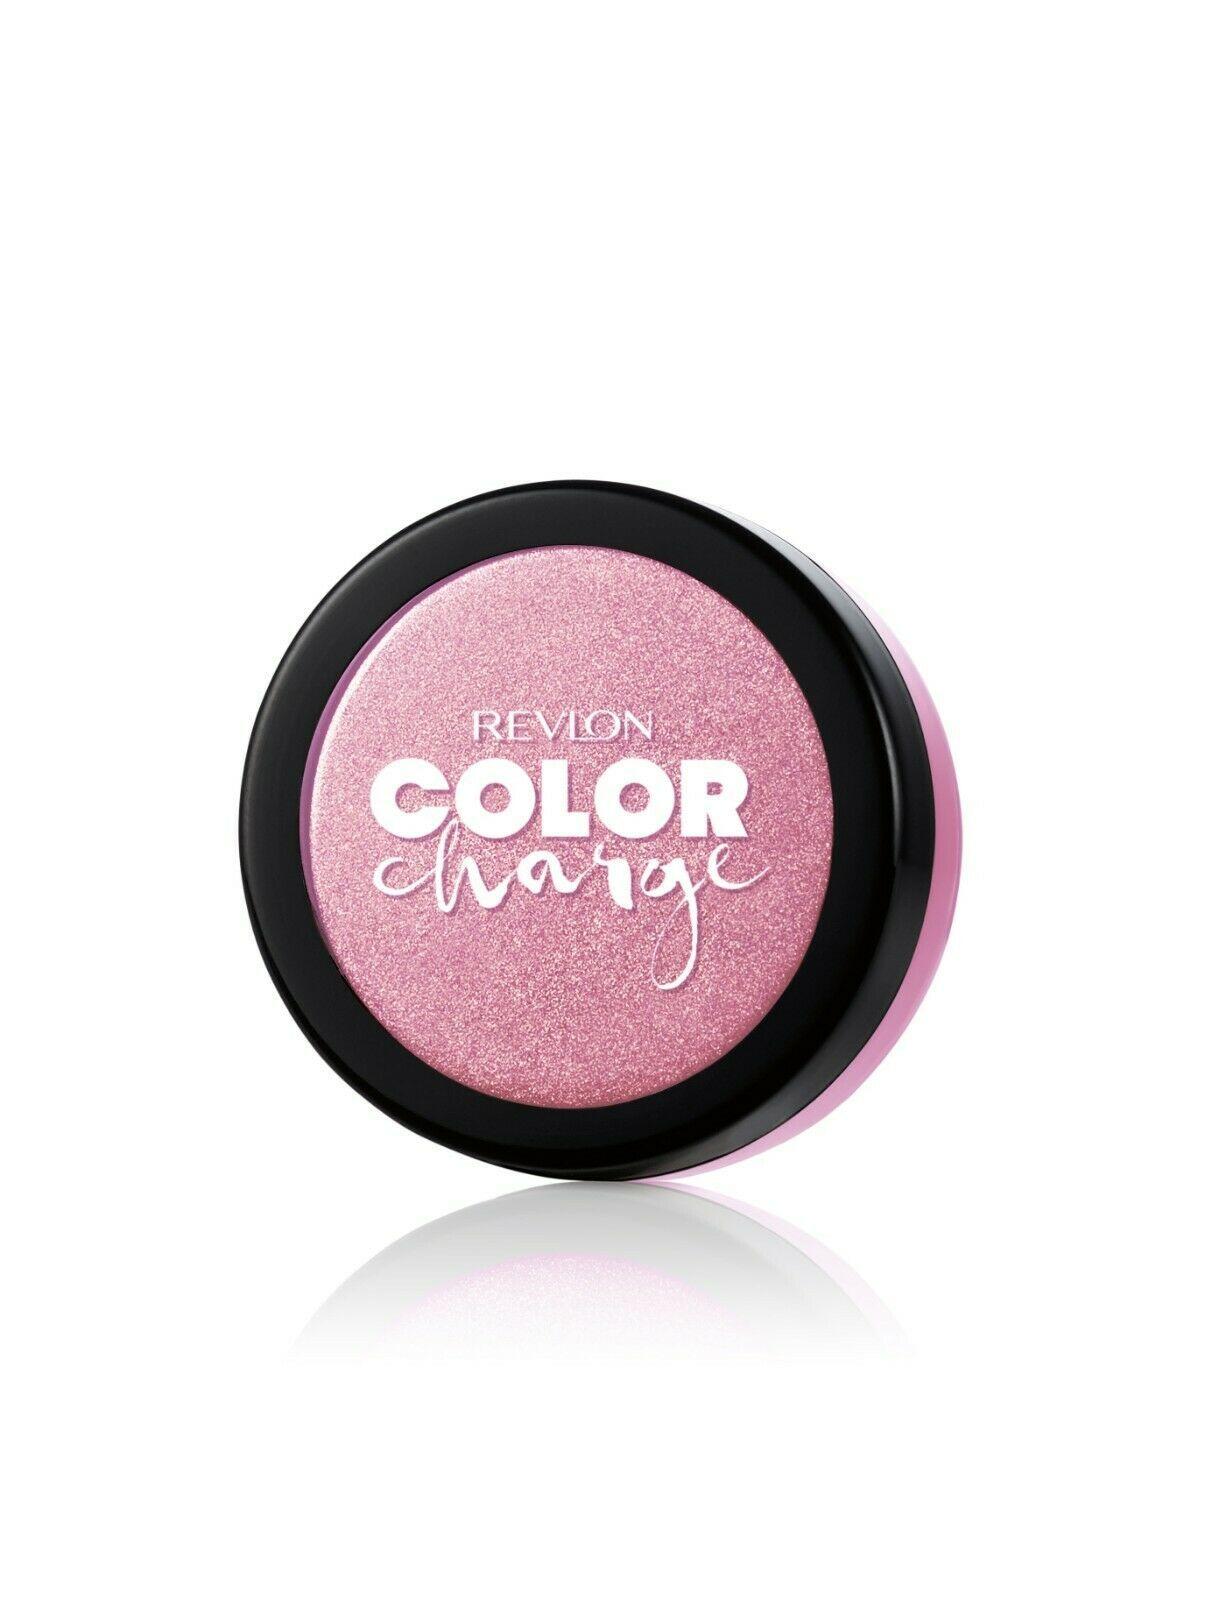 Revlon Color Charge Loose Powder Pigments #106 Fuchsia - $6.92